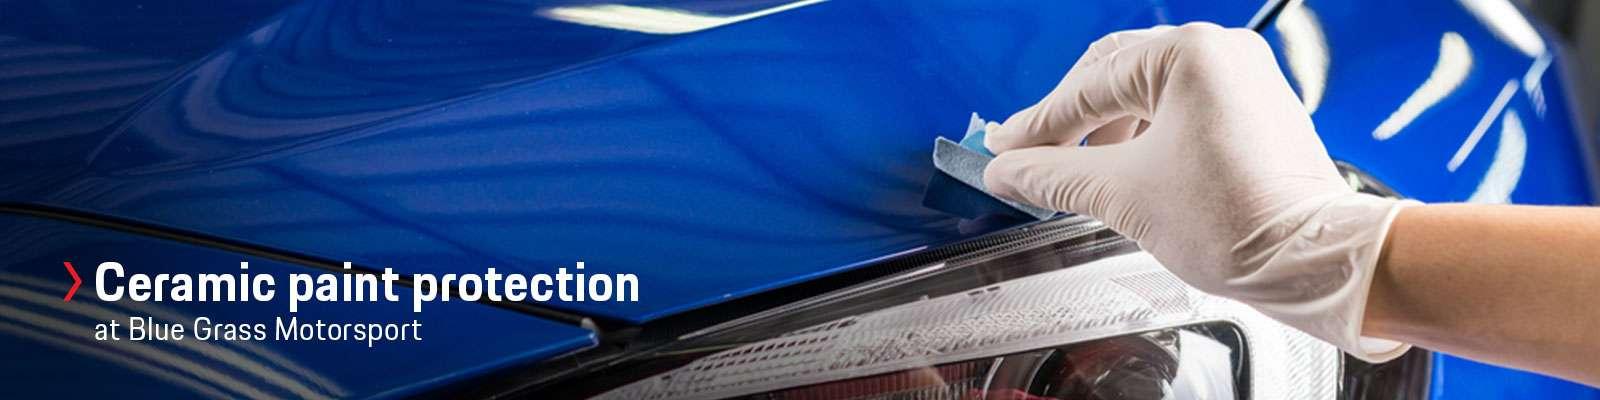 Porsche Paint Protection   Gliptone Quartz Ceramic Coating in Louisville